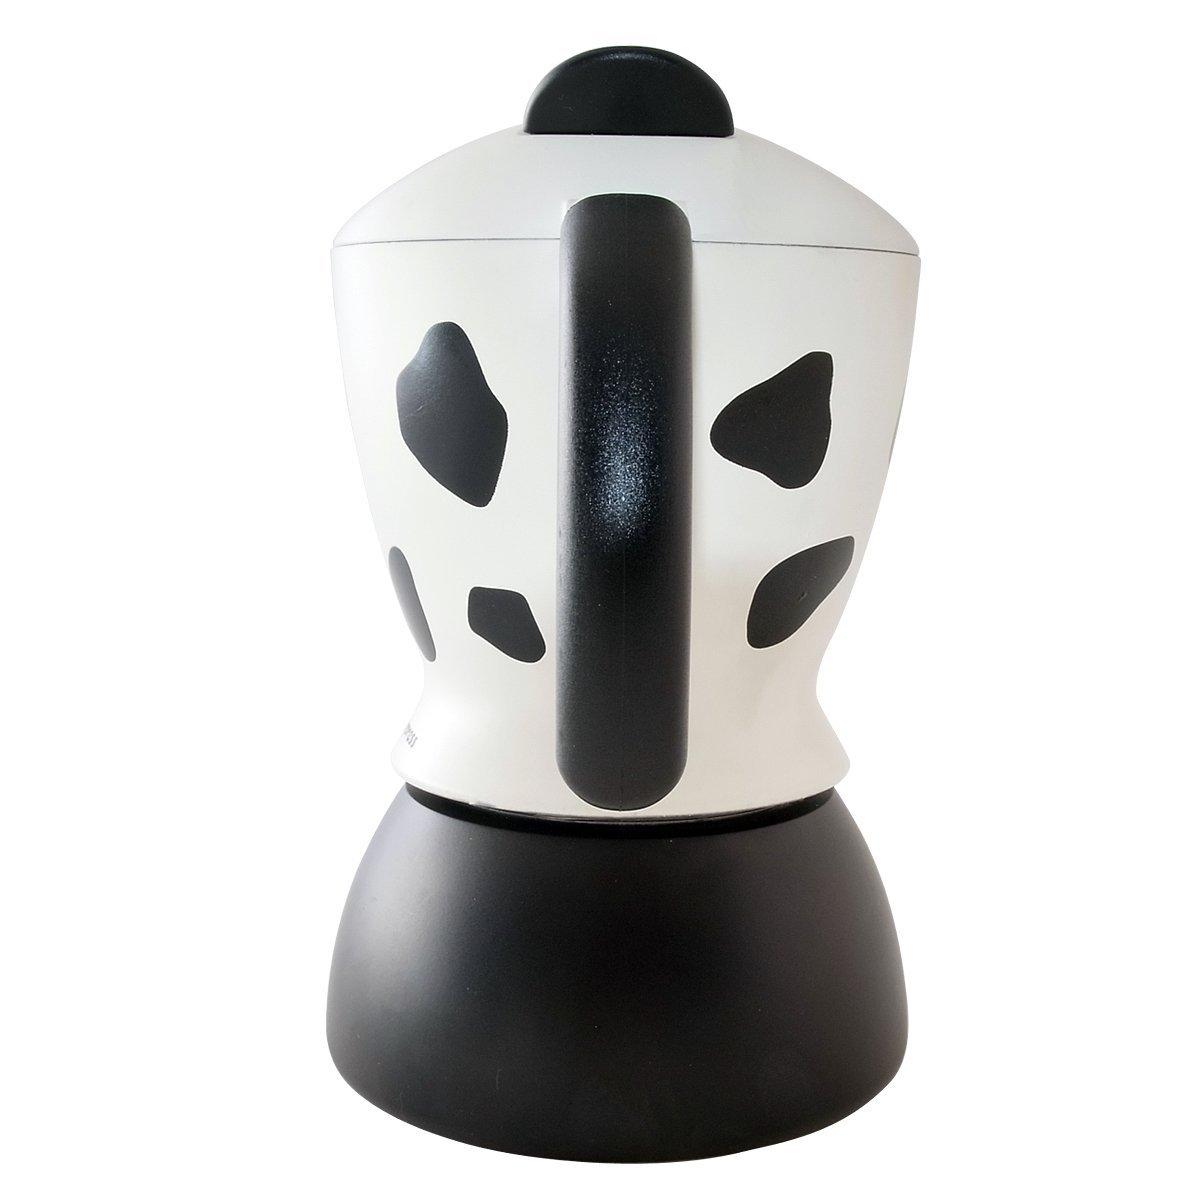 "Кофеварка гейзерная ""Mukka"" на 2 чашки Bialetti MUKKA, черный с белым Bialetti 0003418/NP фото 3"